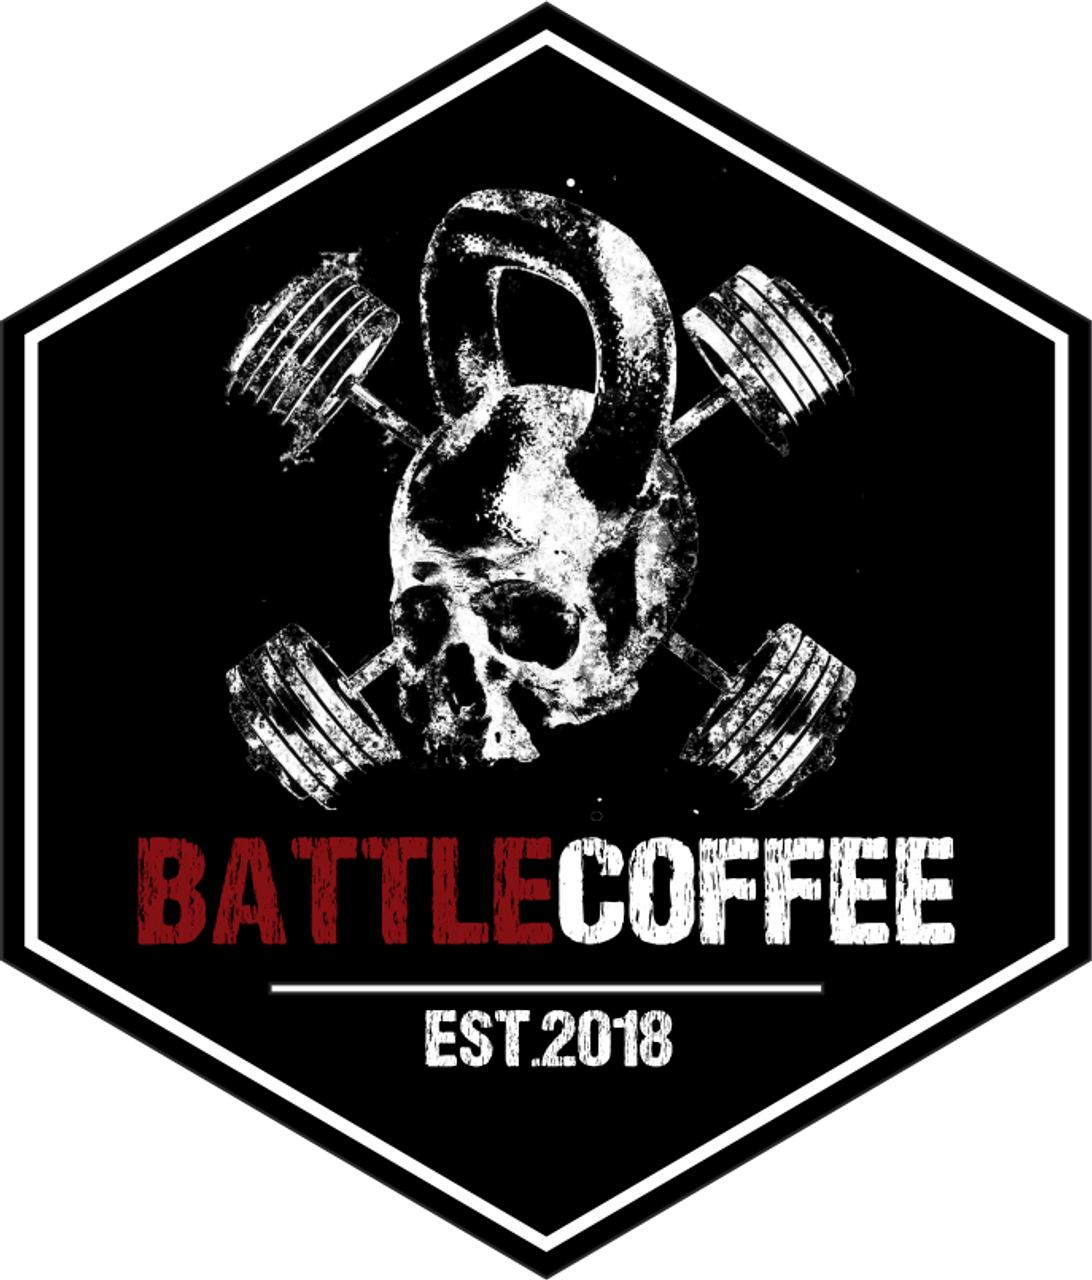 BattleCoffee